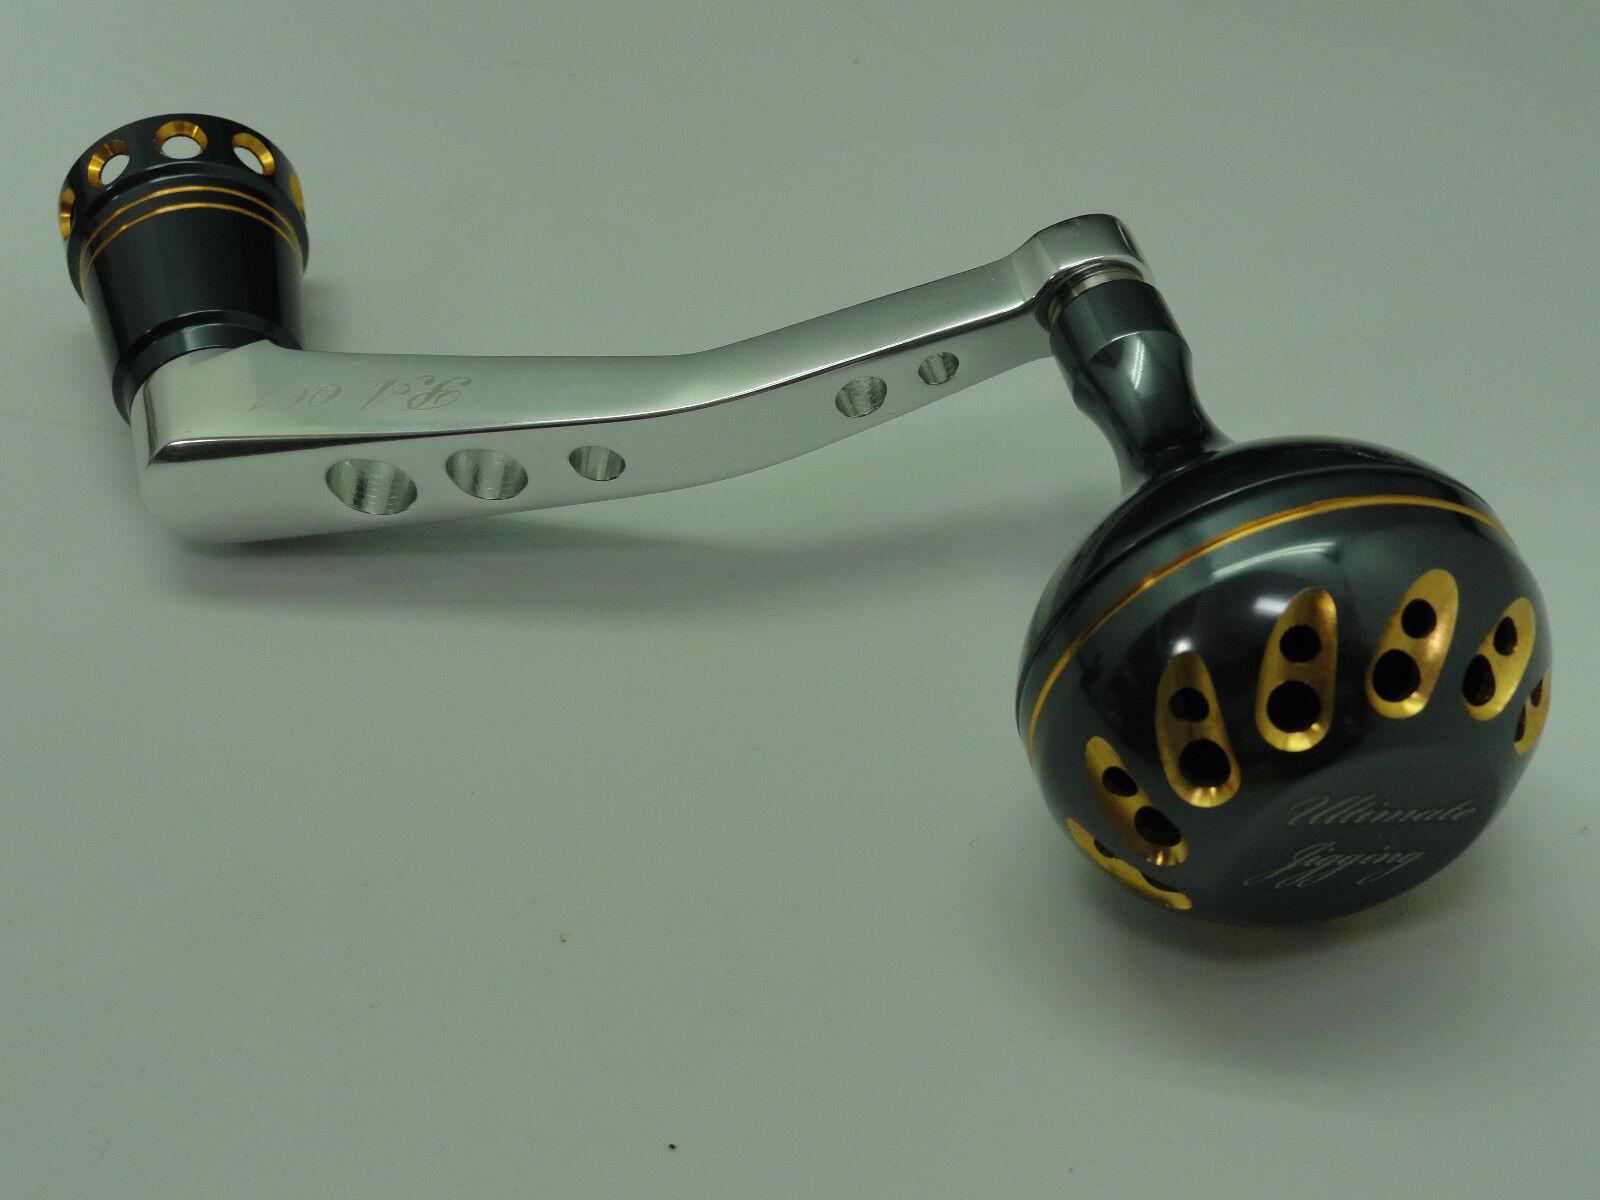 UJ arm PA001 w  PRK45mm knob for Daiwa Saltiga Dog Fight 45008000 reel GR-GD